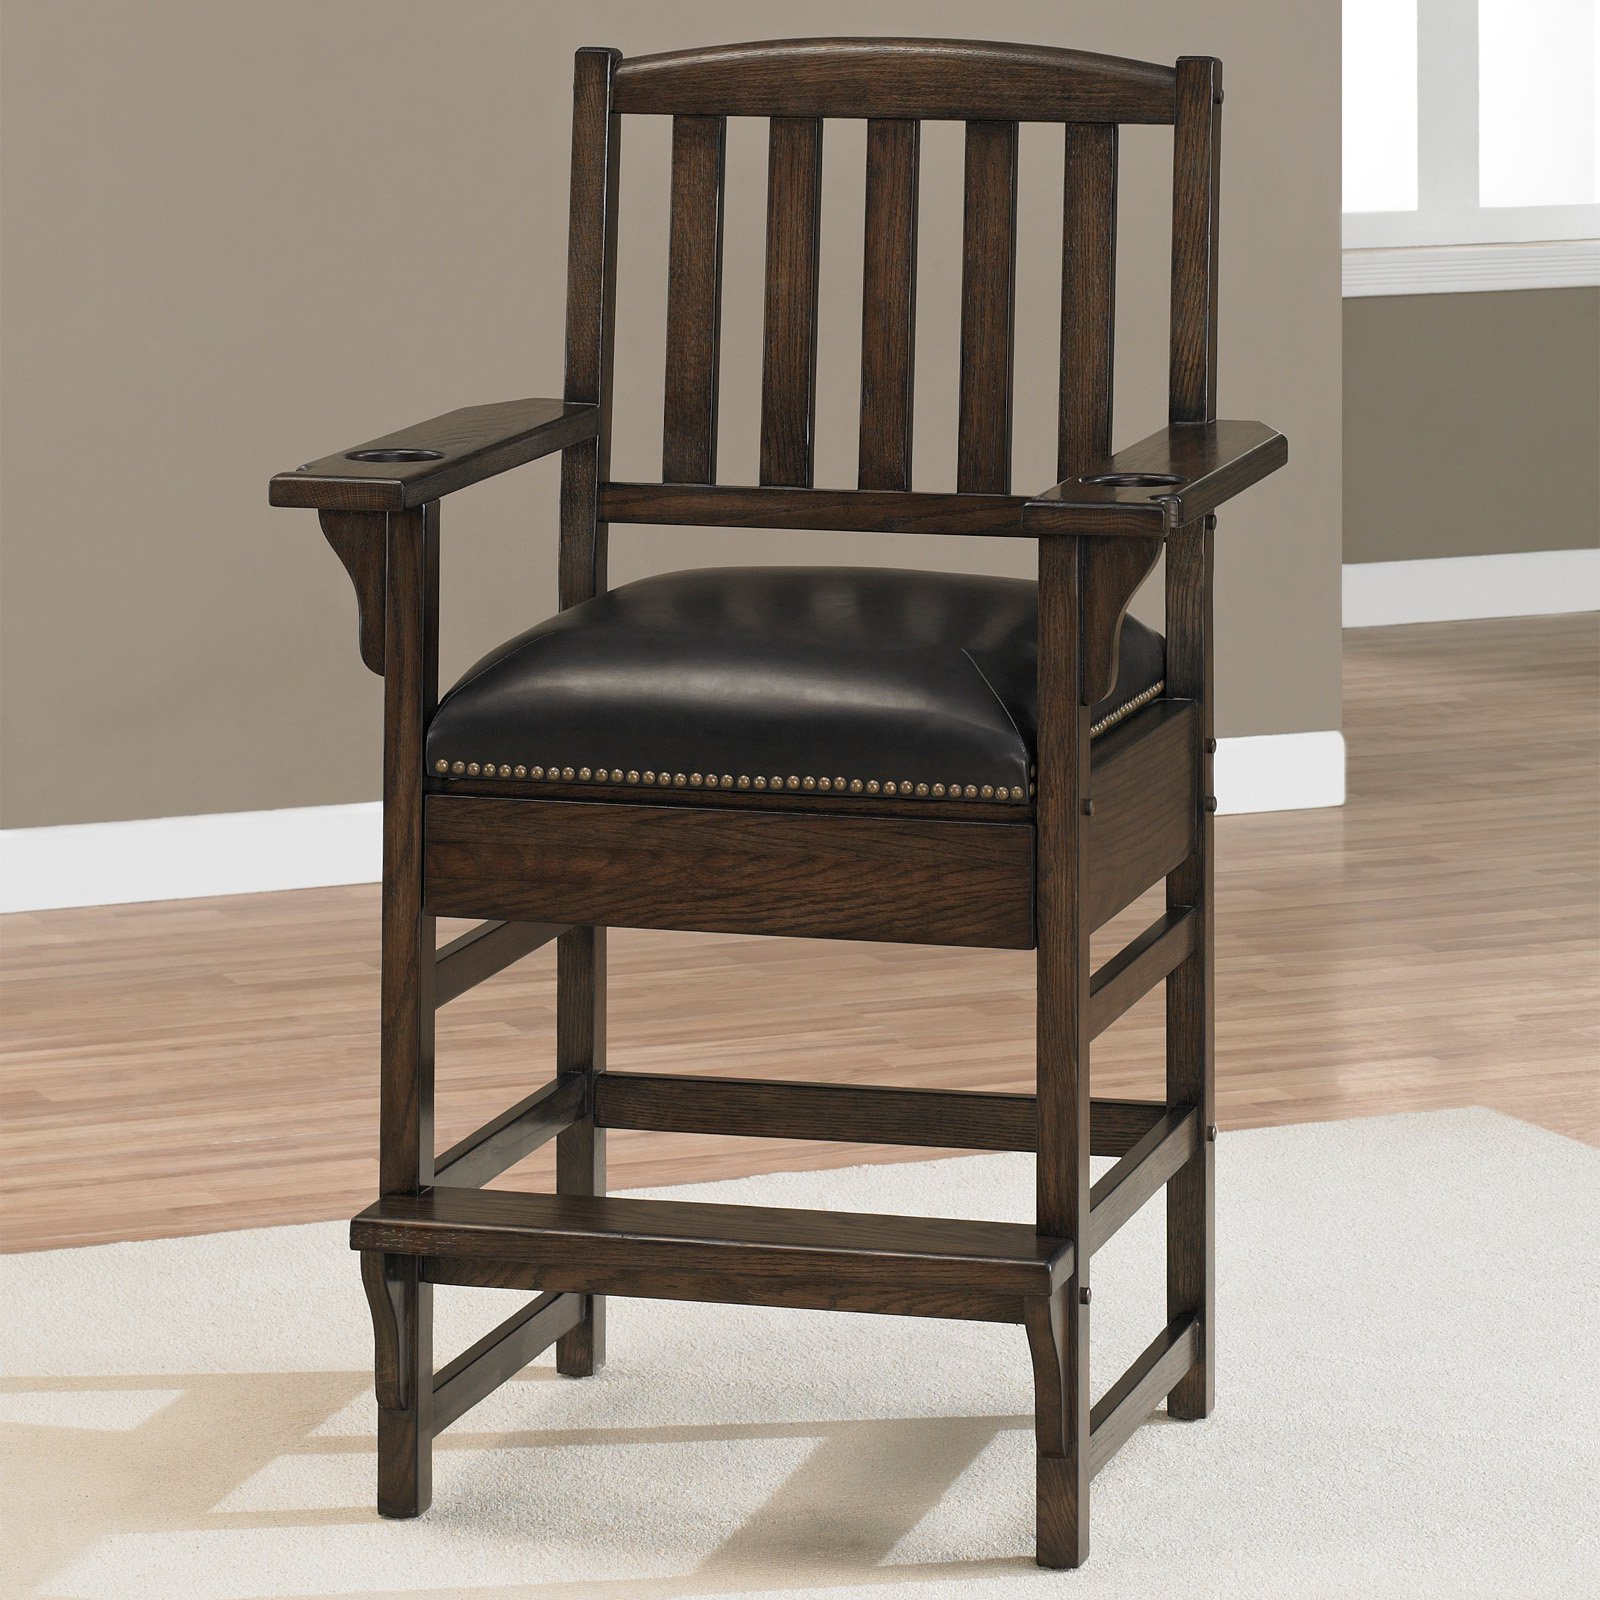 AHB King Chair Bar Stool Cherry by American Heritage Billiards